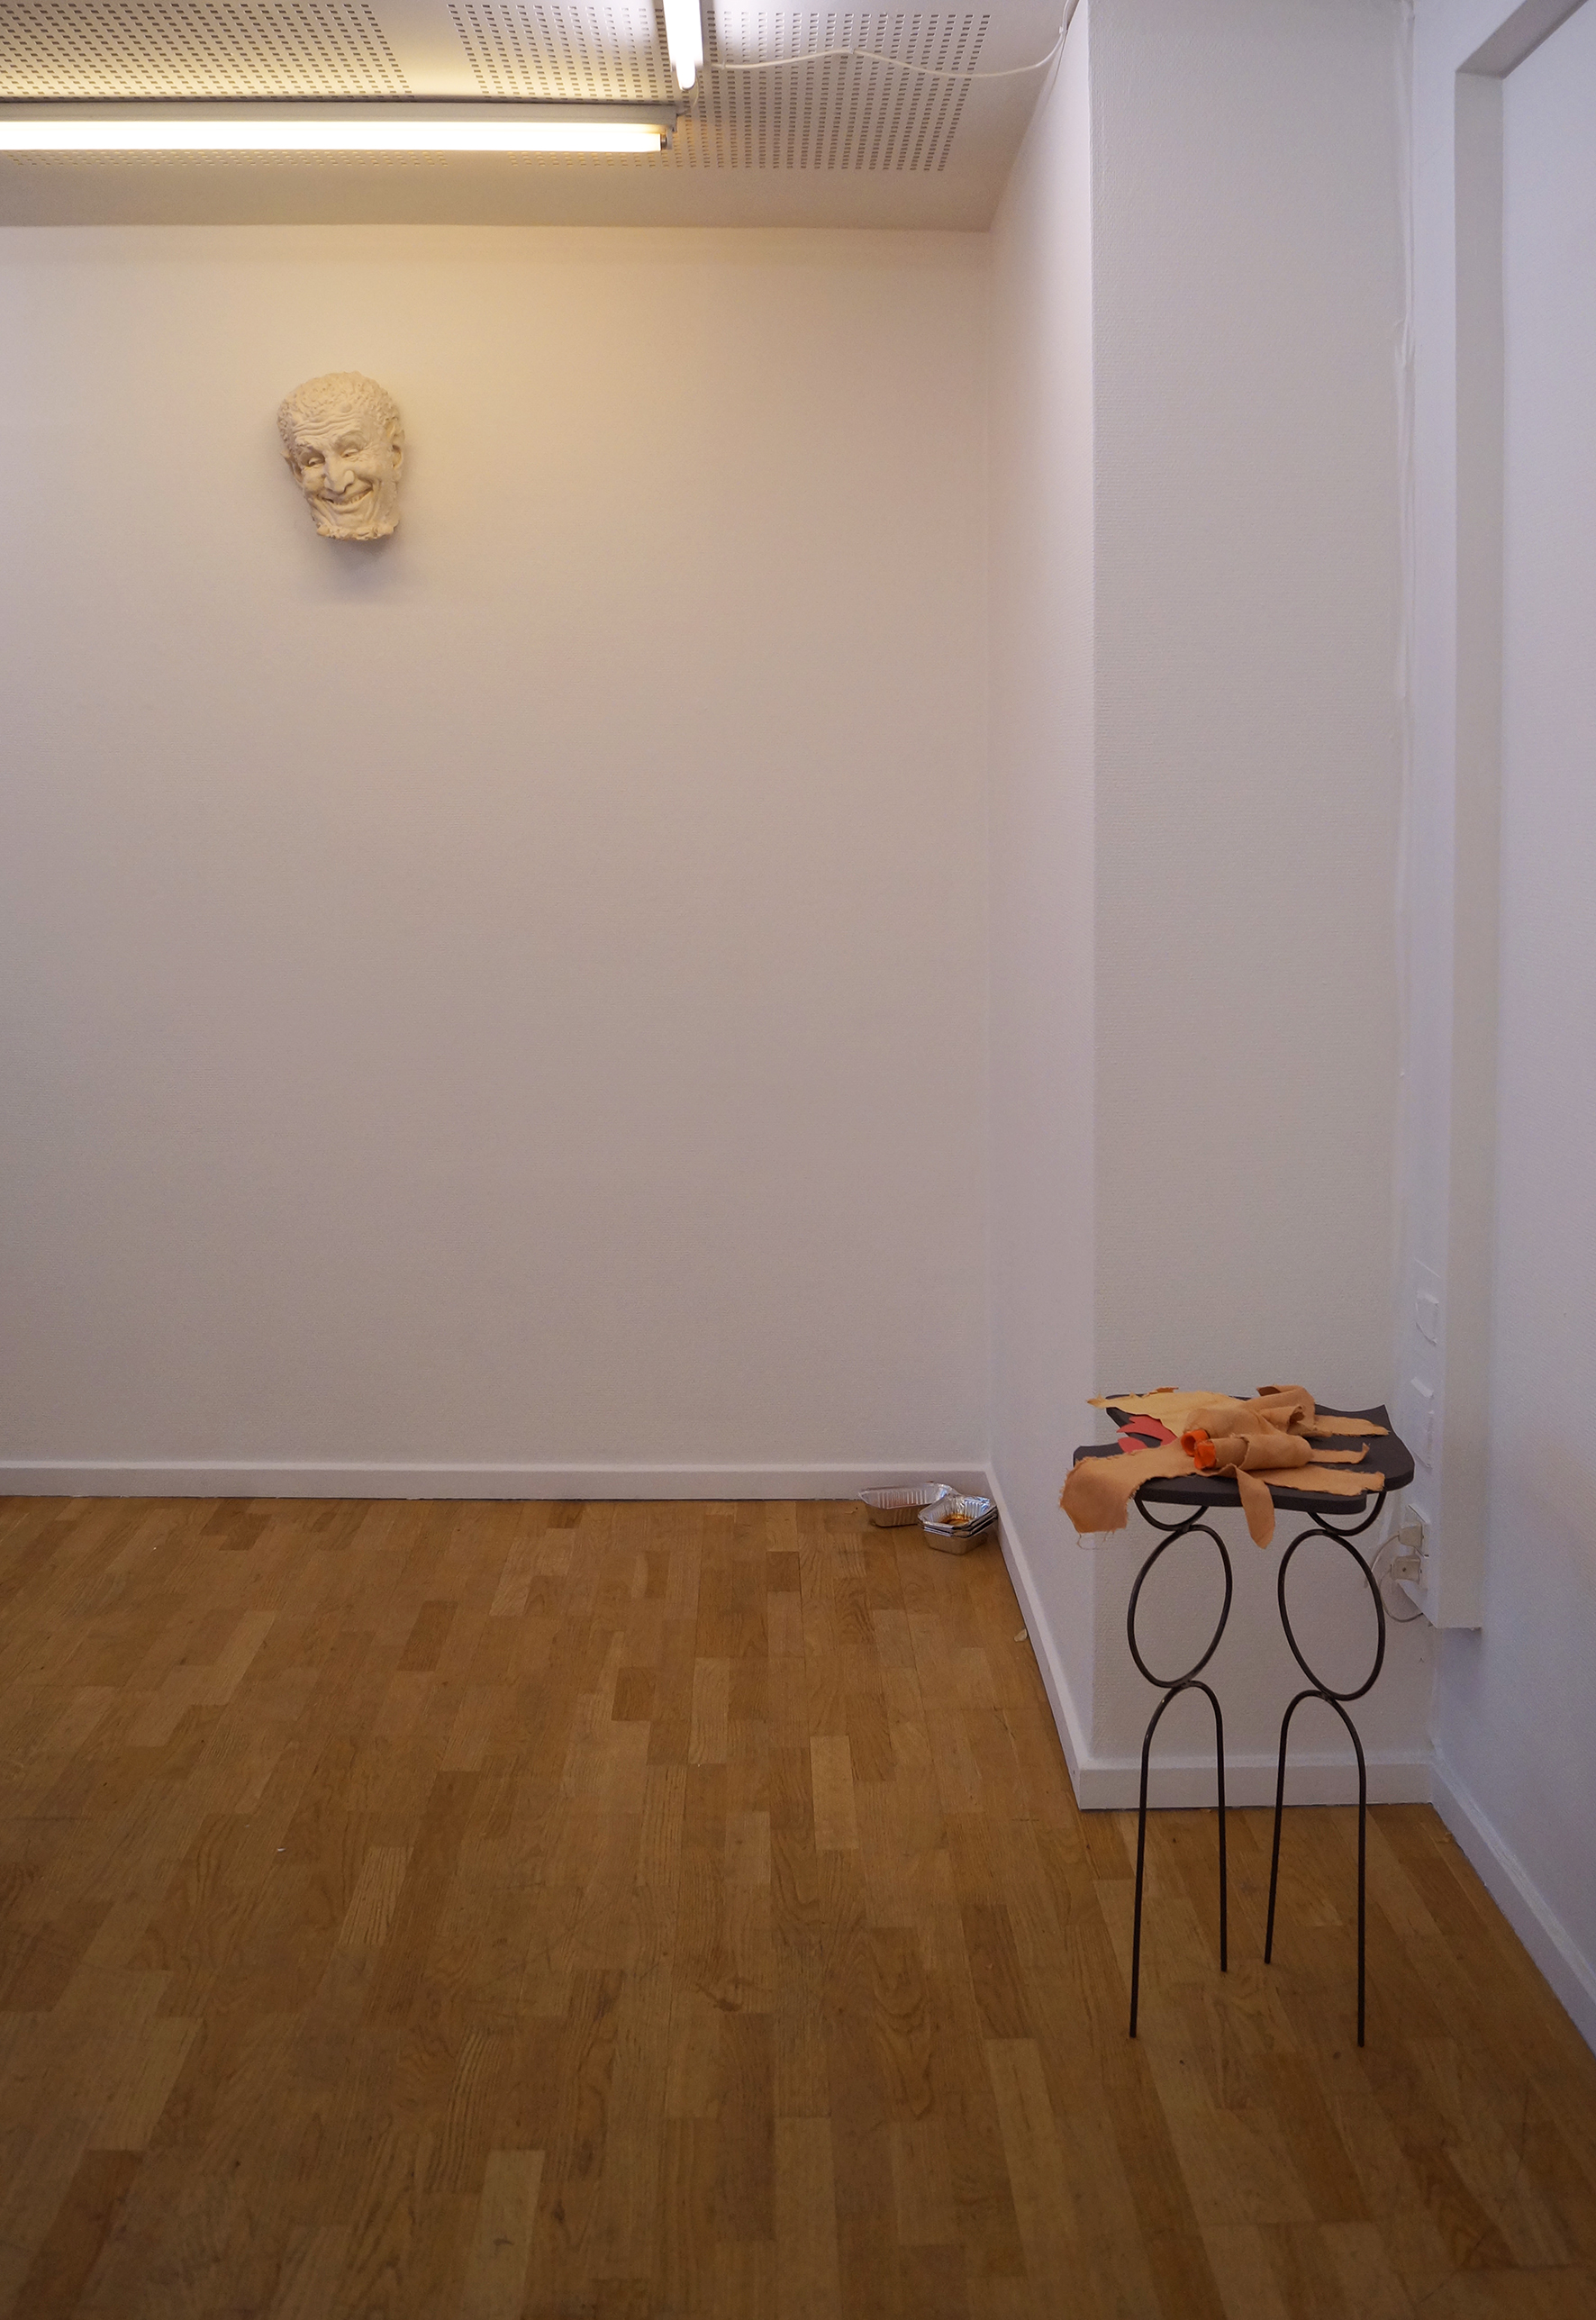 Indoors (installation view)